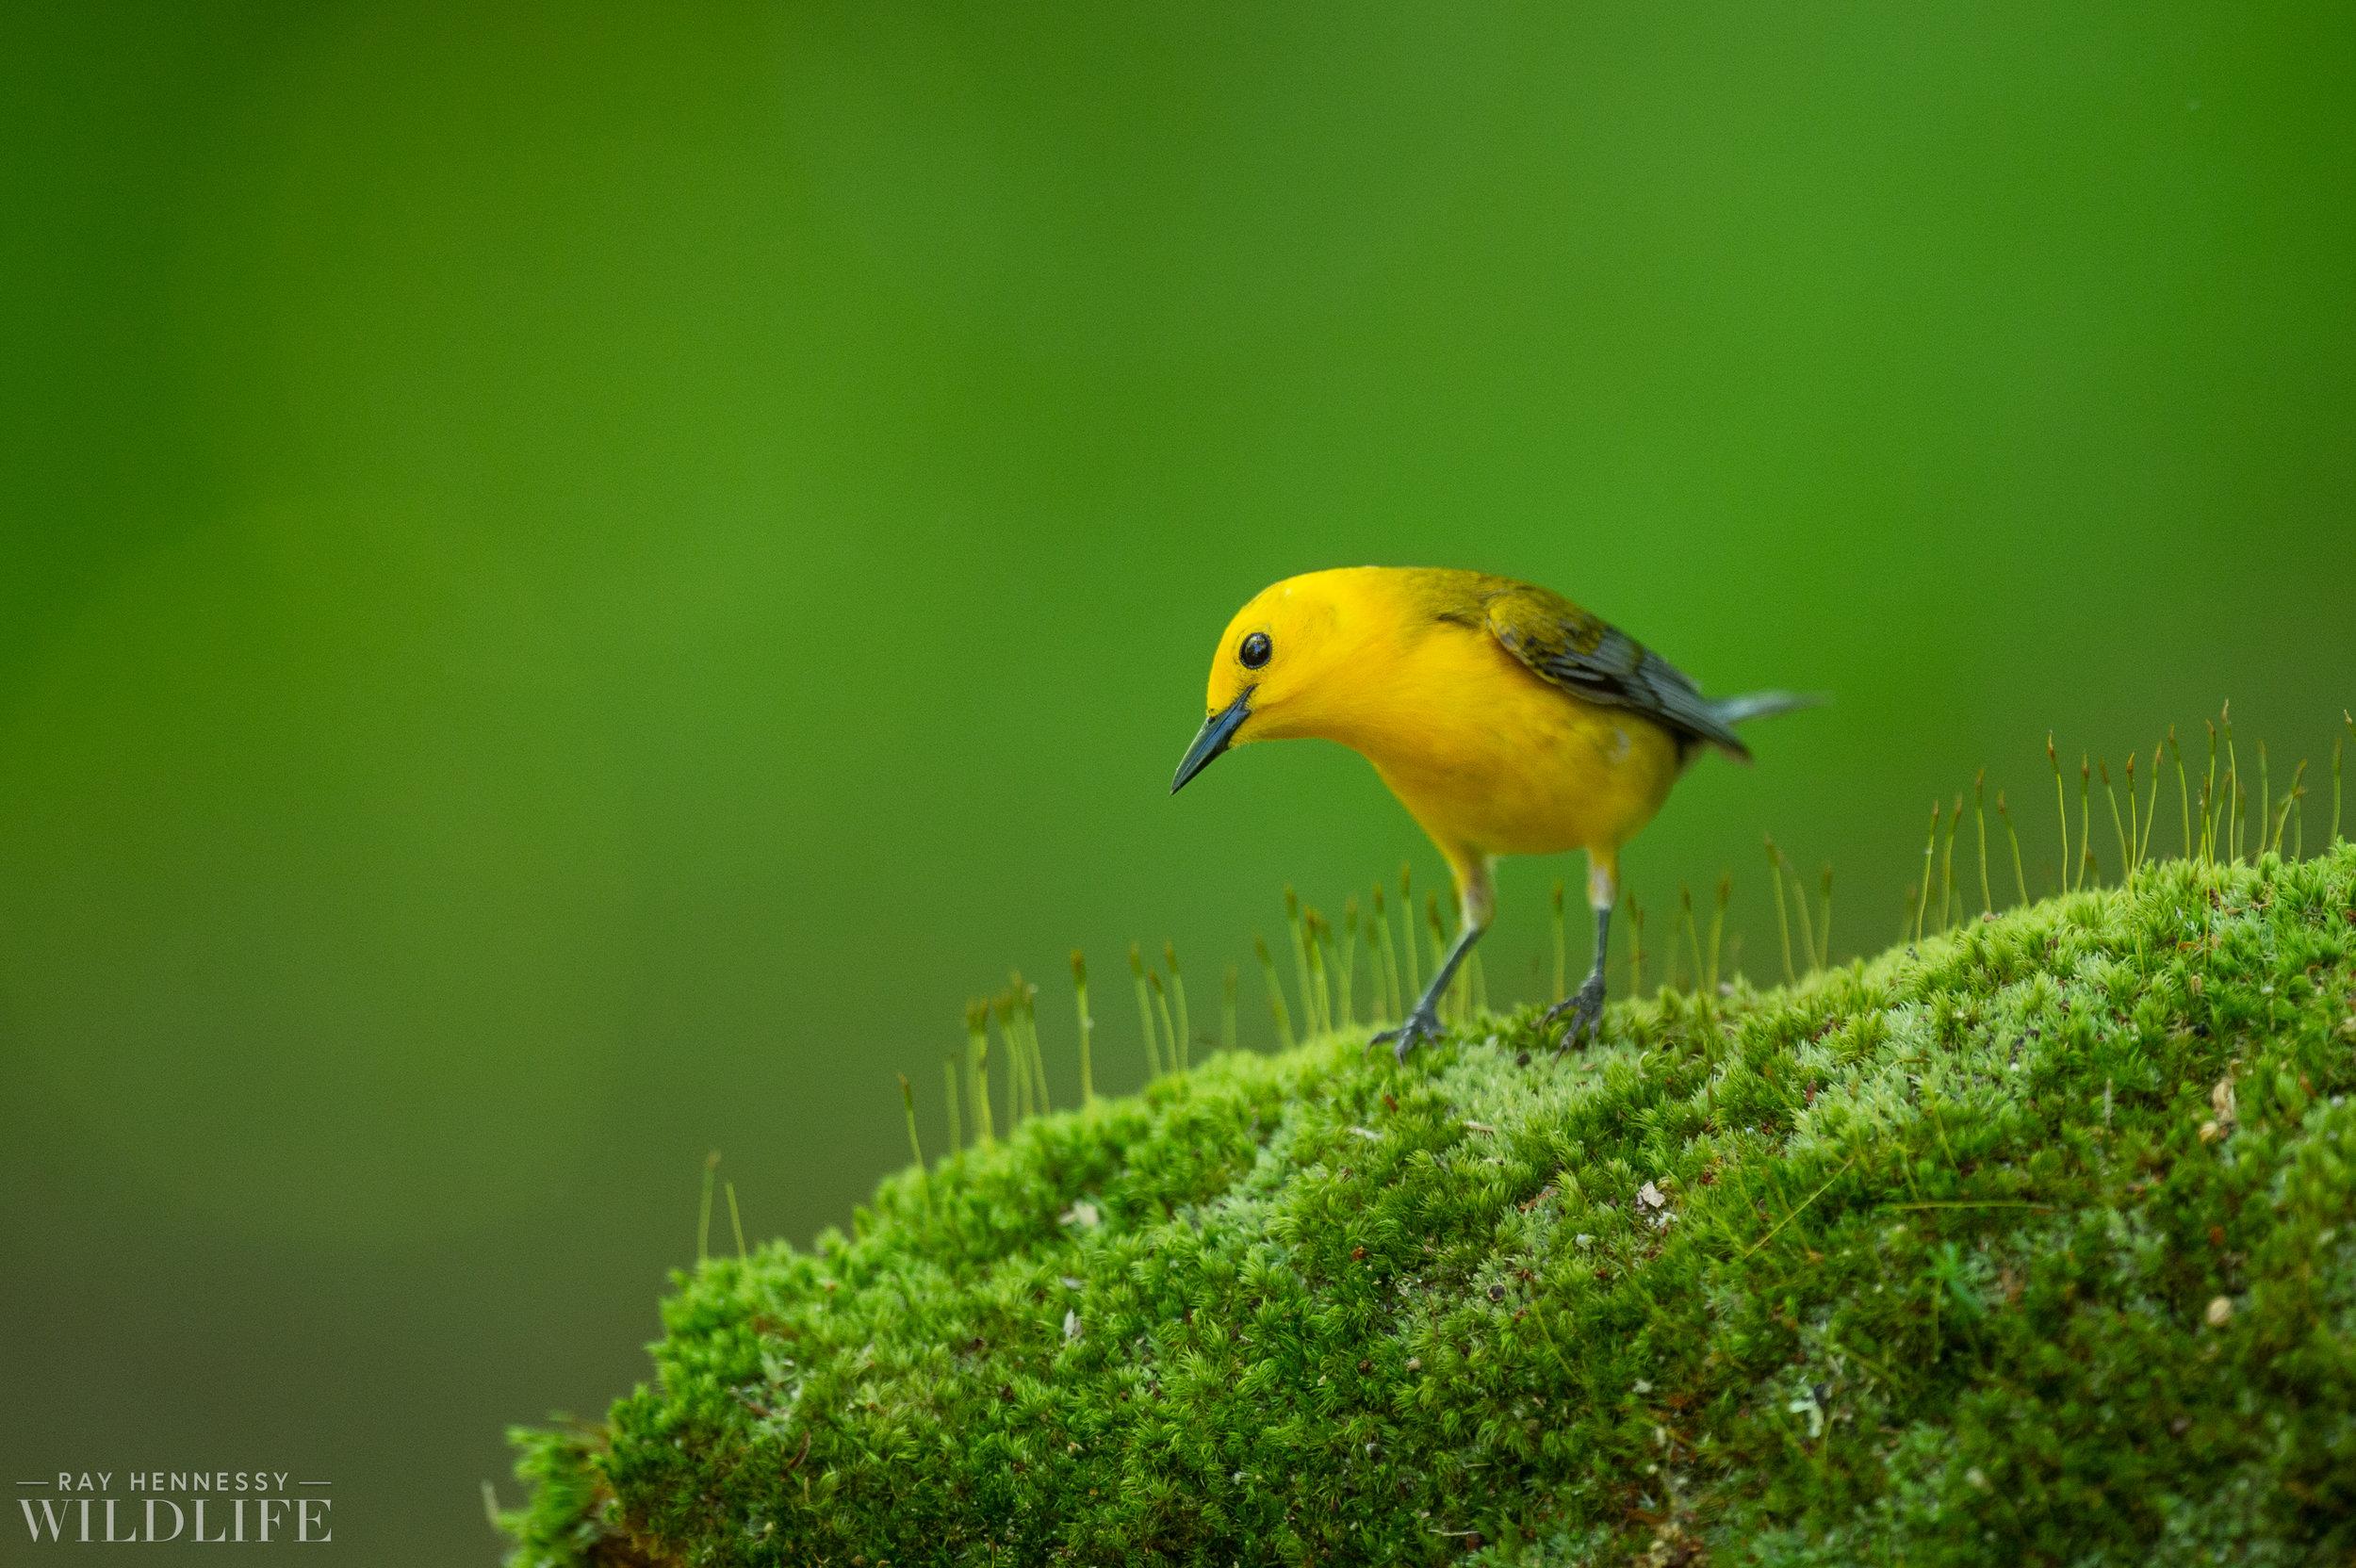 023_shorebirds-prothonotary-warbler.jpg